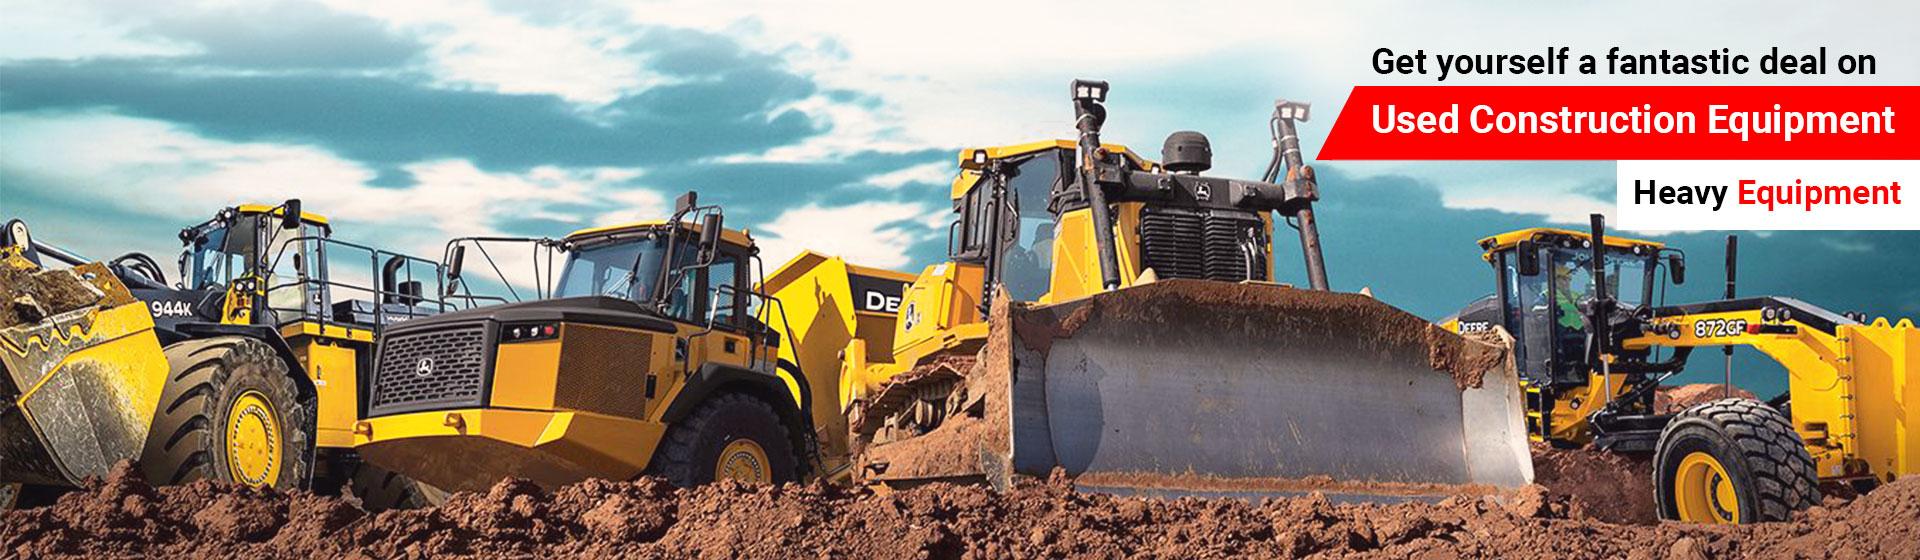 Construction Equipment & Heavy Machinery